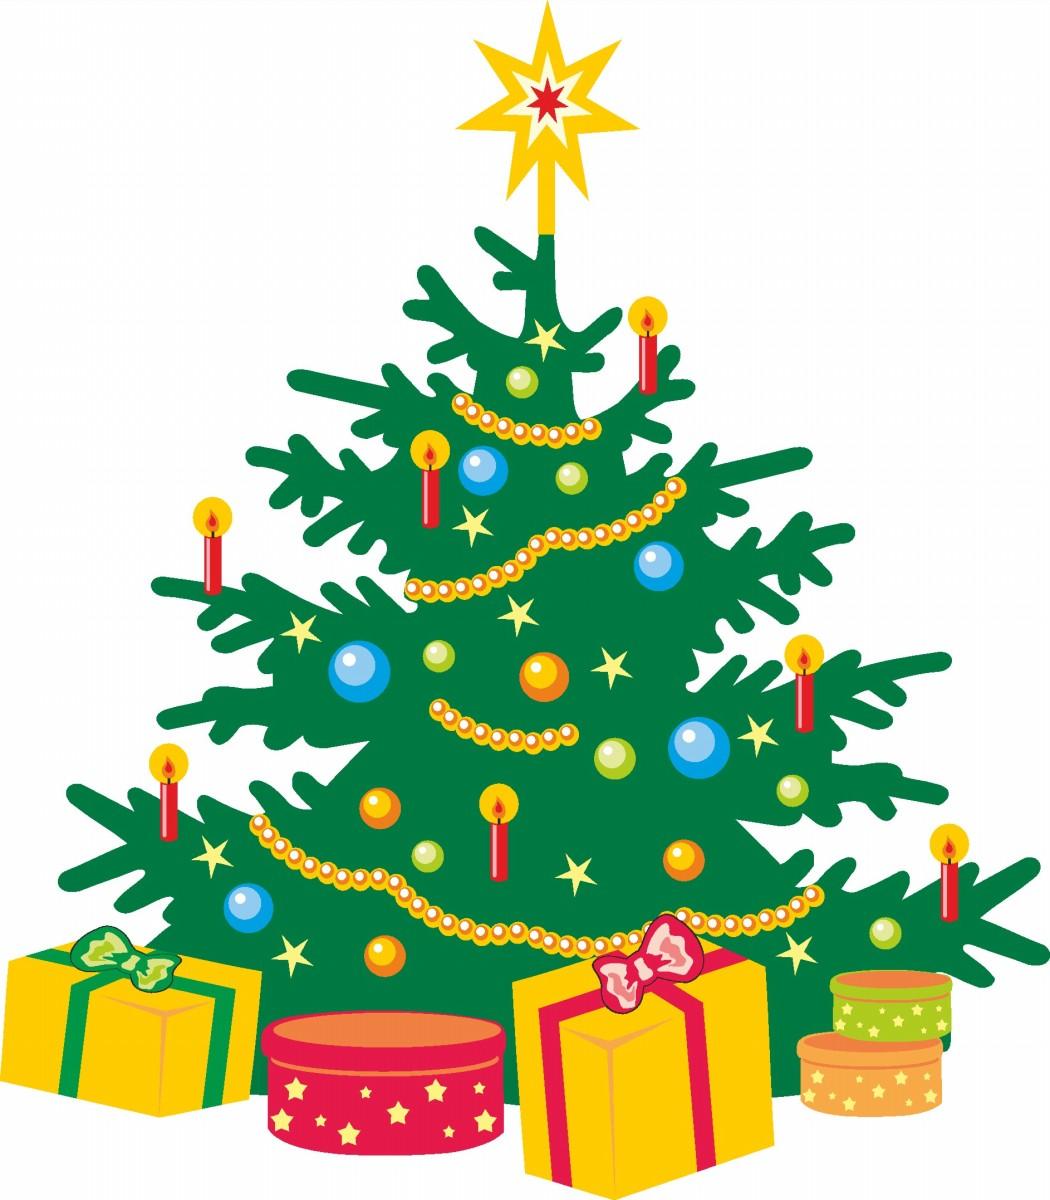 Cartoon Christmas Trees - Cliparts.co